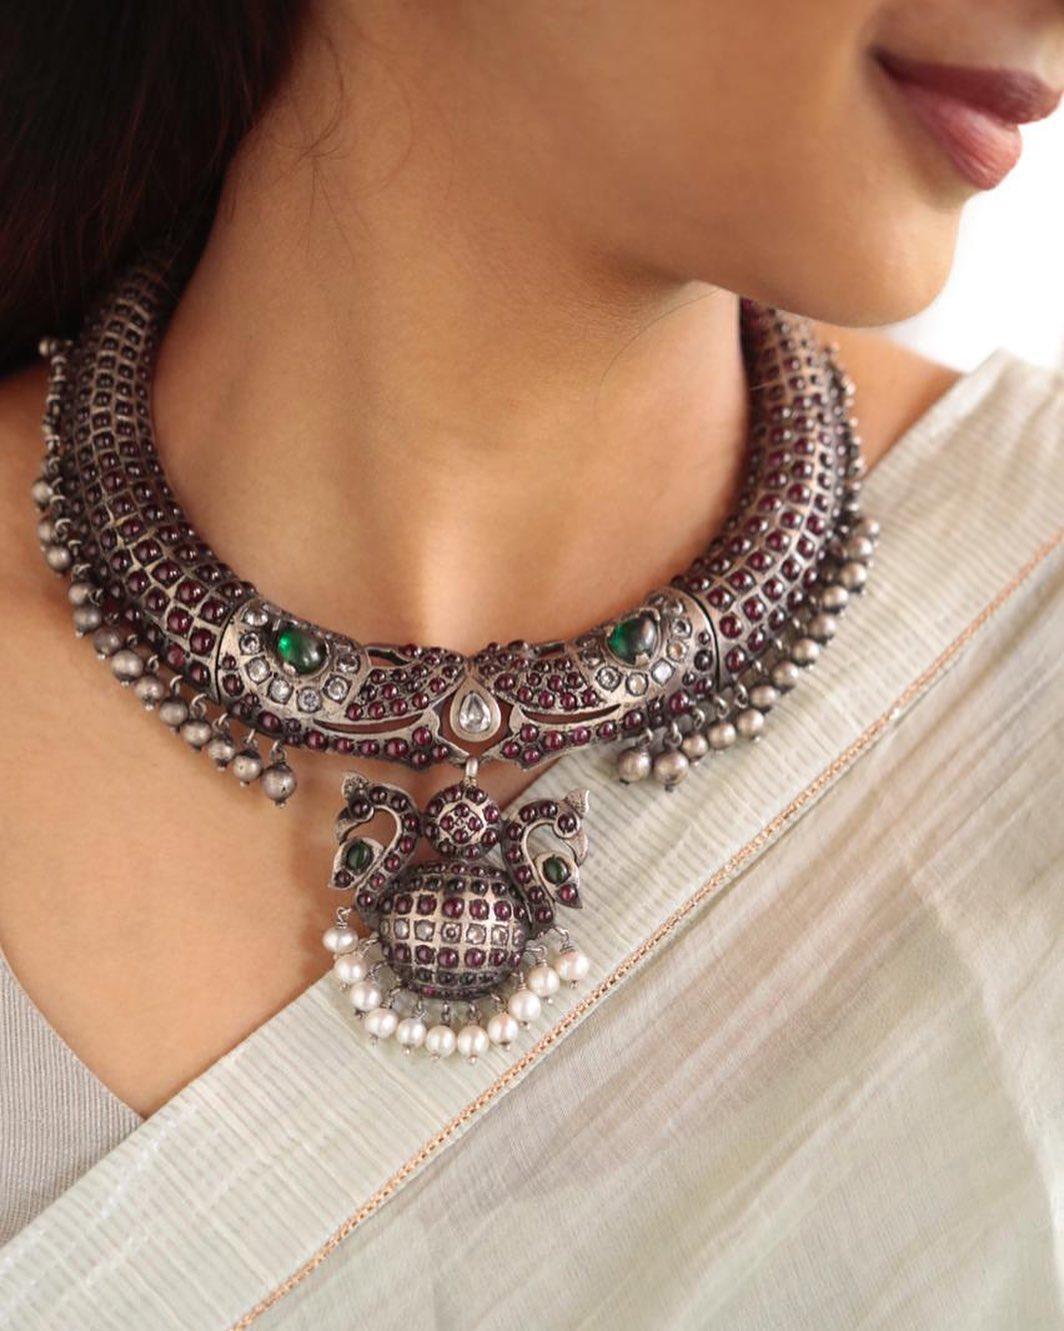 kemp-german-silver-neckpiece